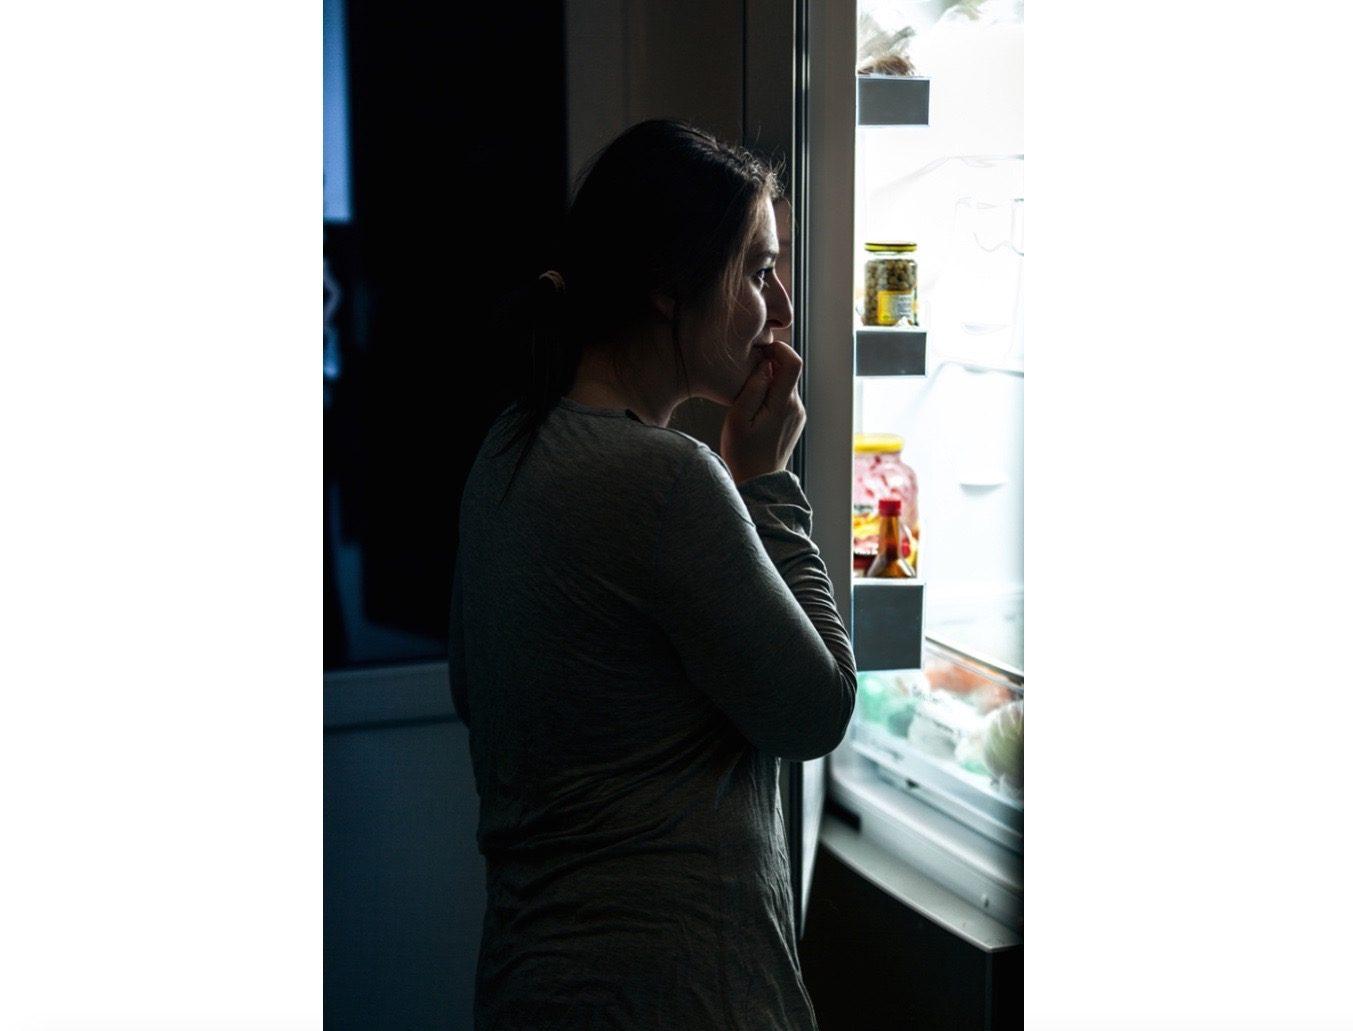 binge-eating-disorder-myths-facts